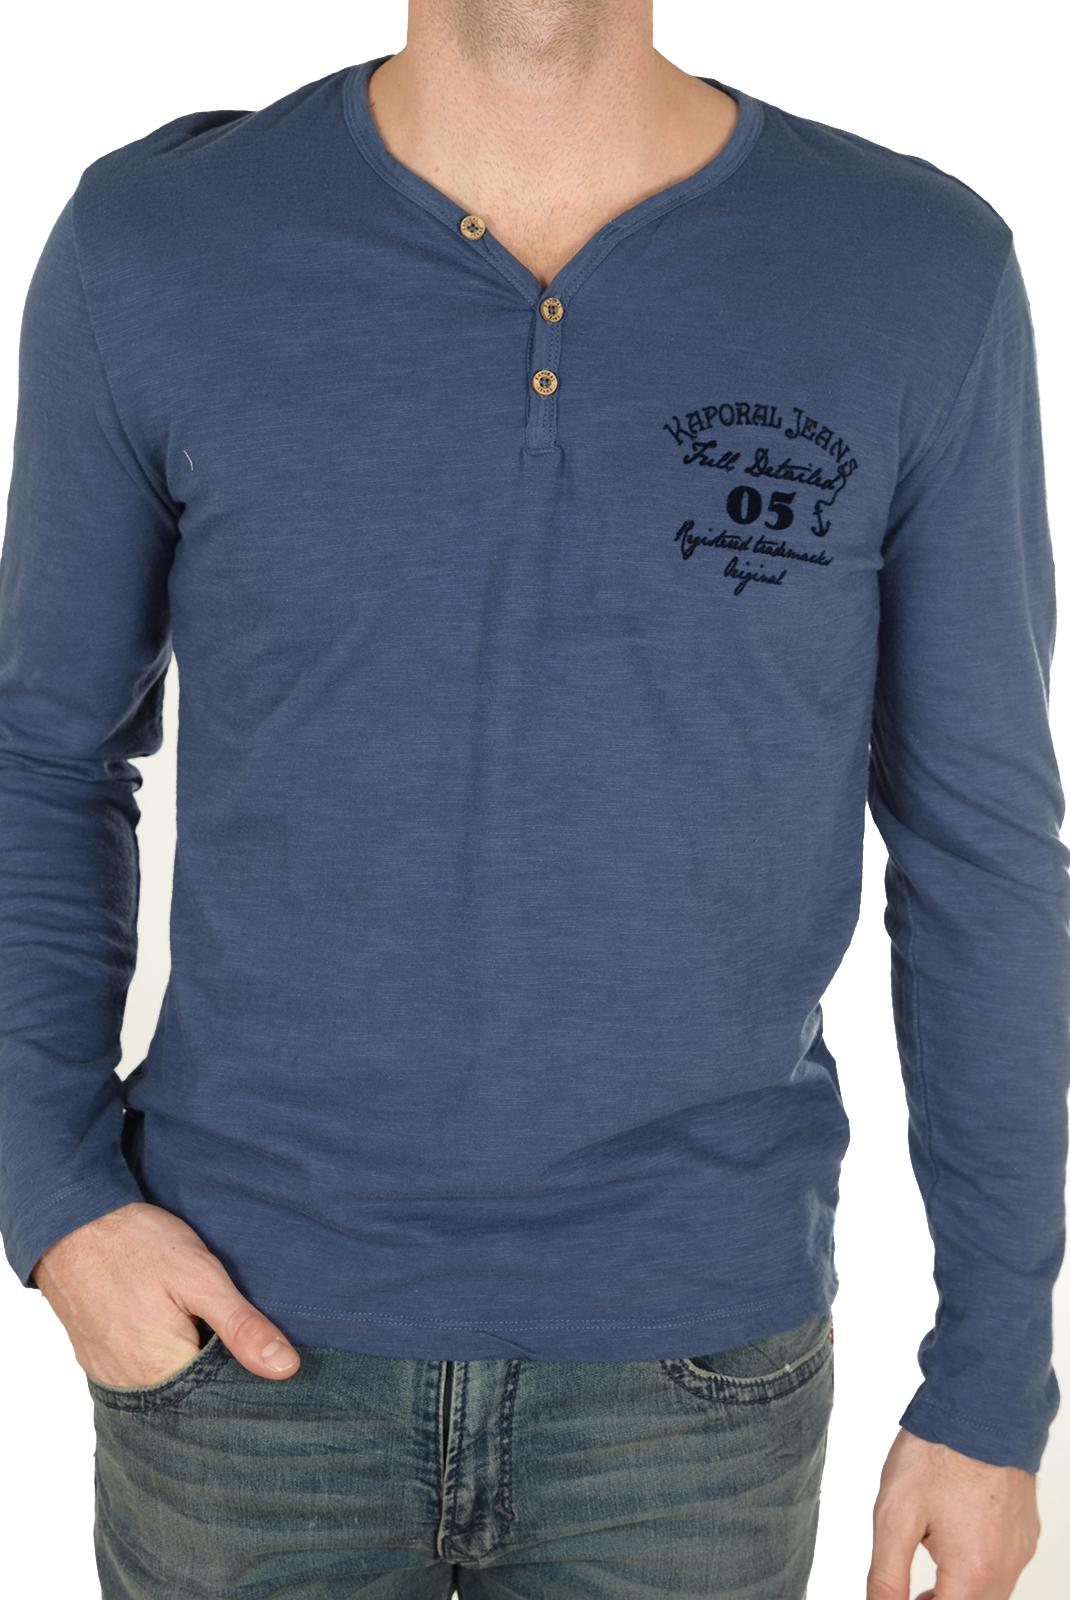 Tee-shirts  Kaporal CRIKO JEANS